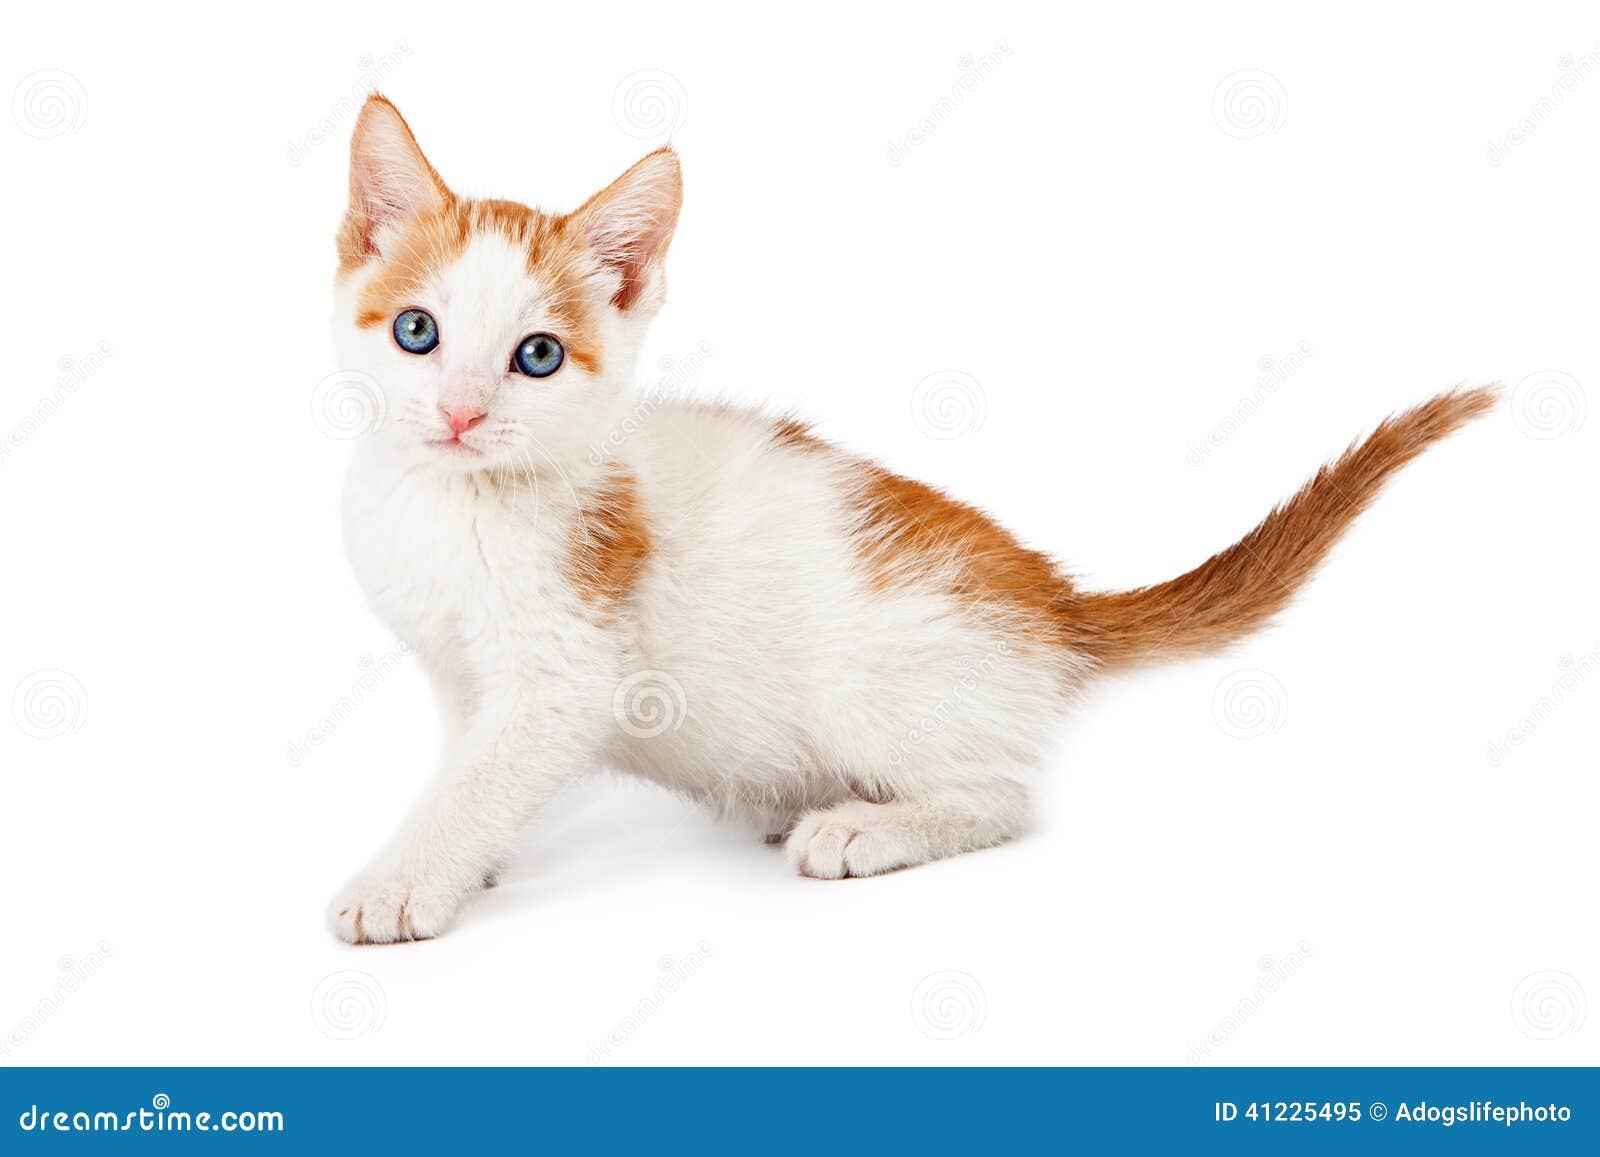 Kitten Orange And White Looking At Camera Stock Image Image